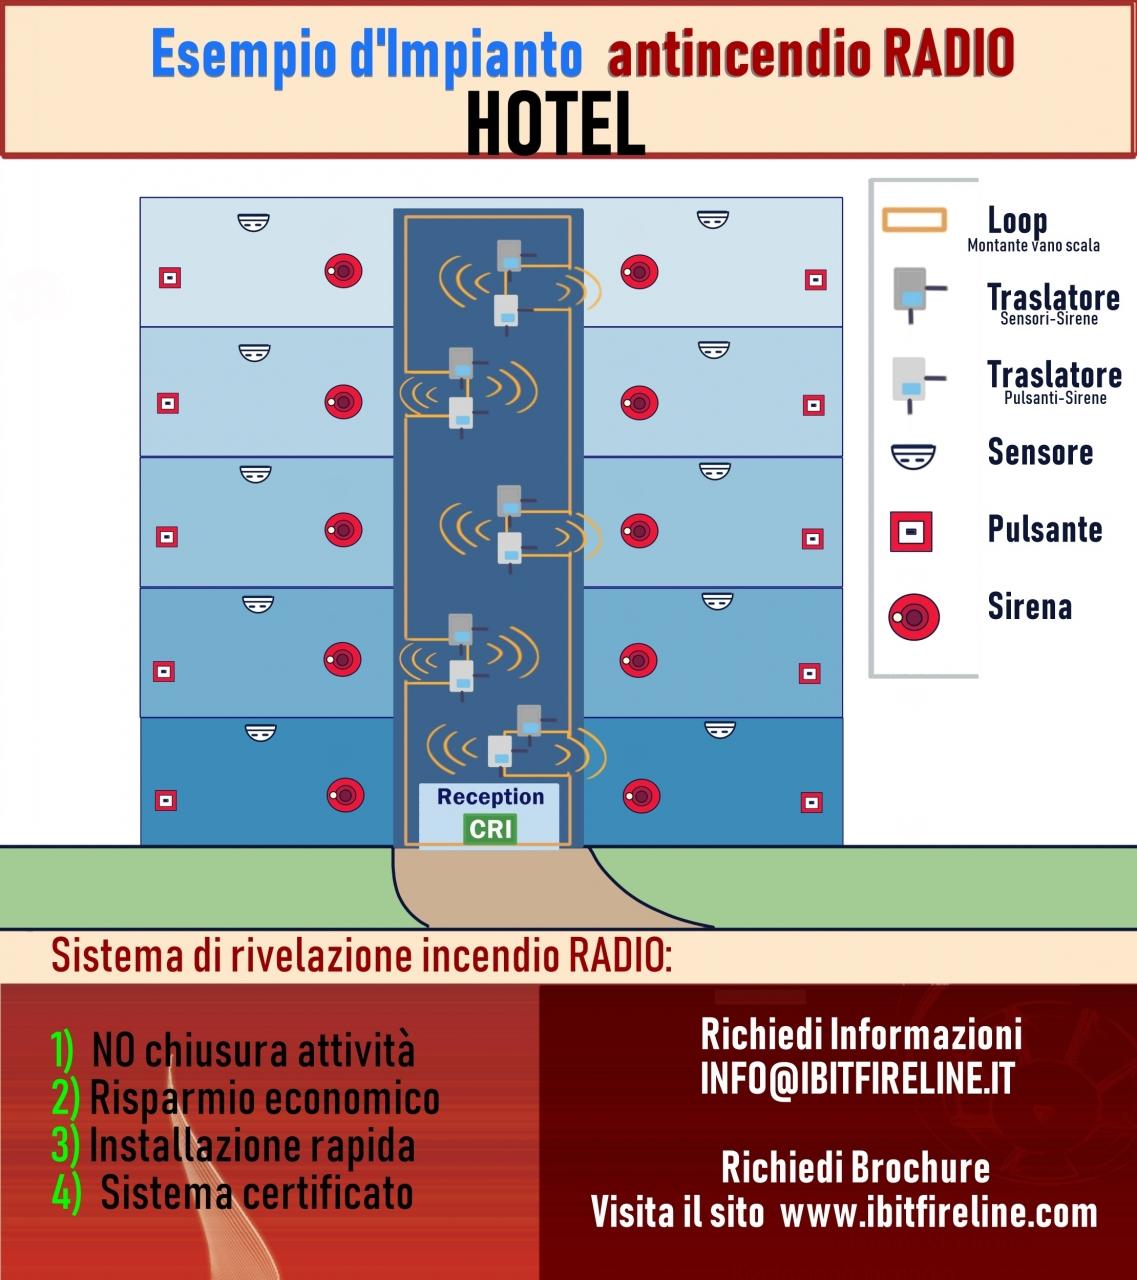 HOTELEDIL2a